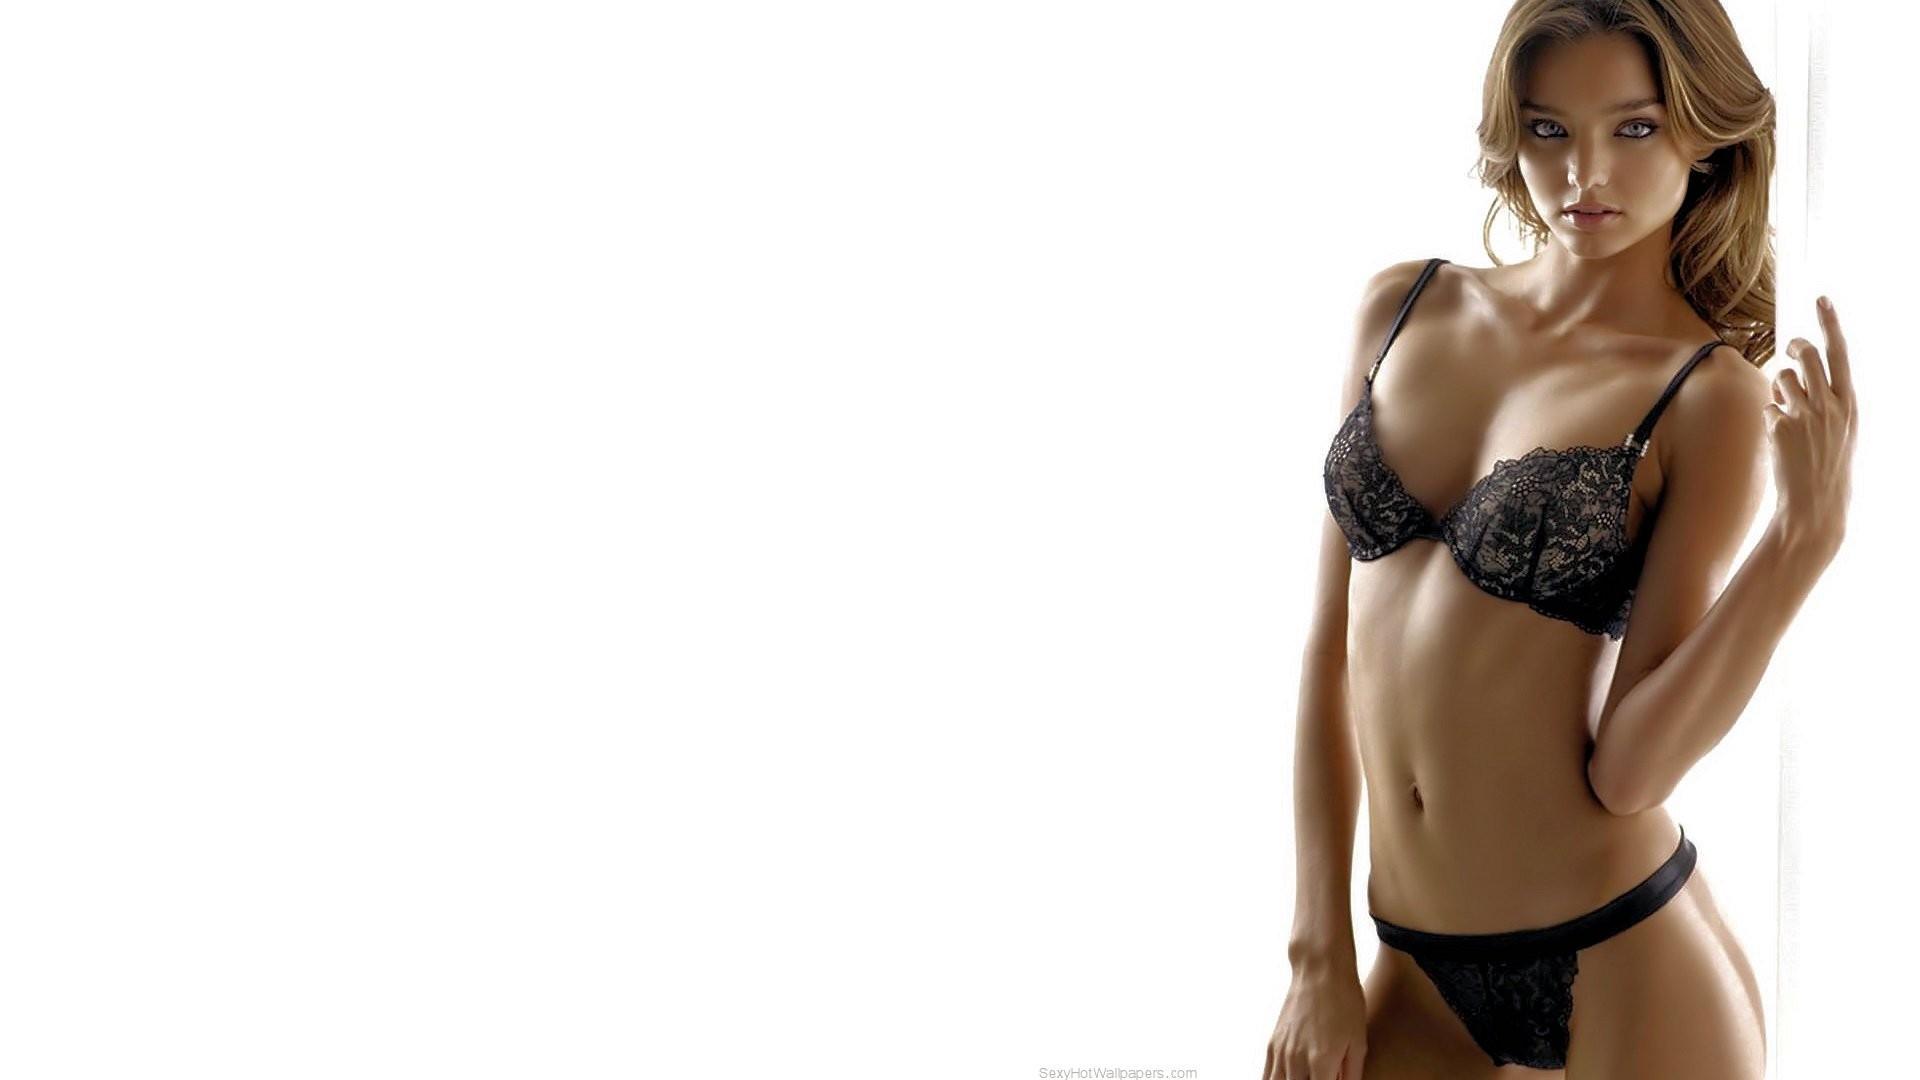 f0362f69aa842 women model simple background lingerie Miranda Kerr black lingerie black  bras swimwear clothing supermodel black panties